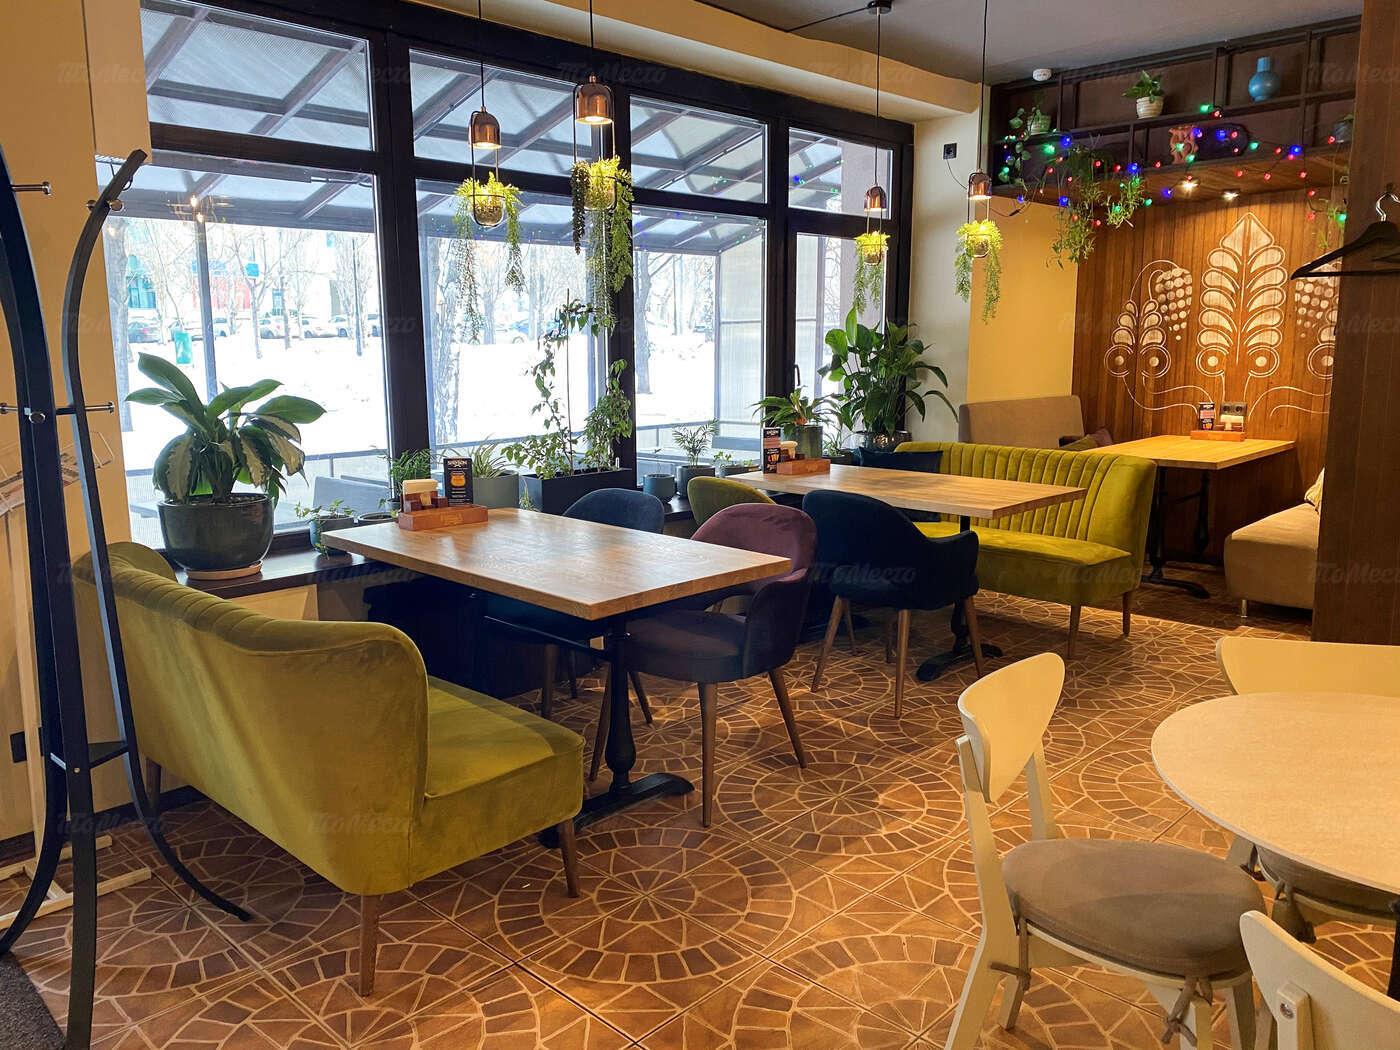 Банкеты кафе Хинкали & Хачапури на Ленина фото 4